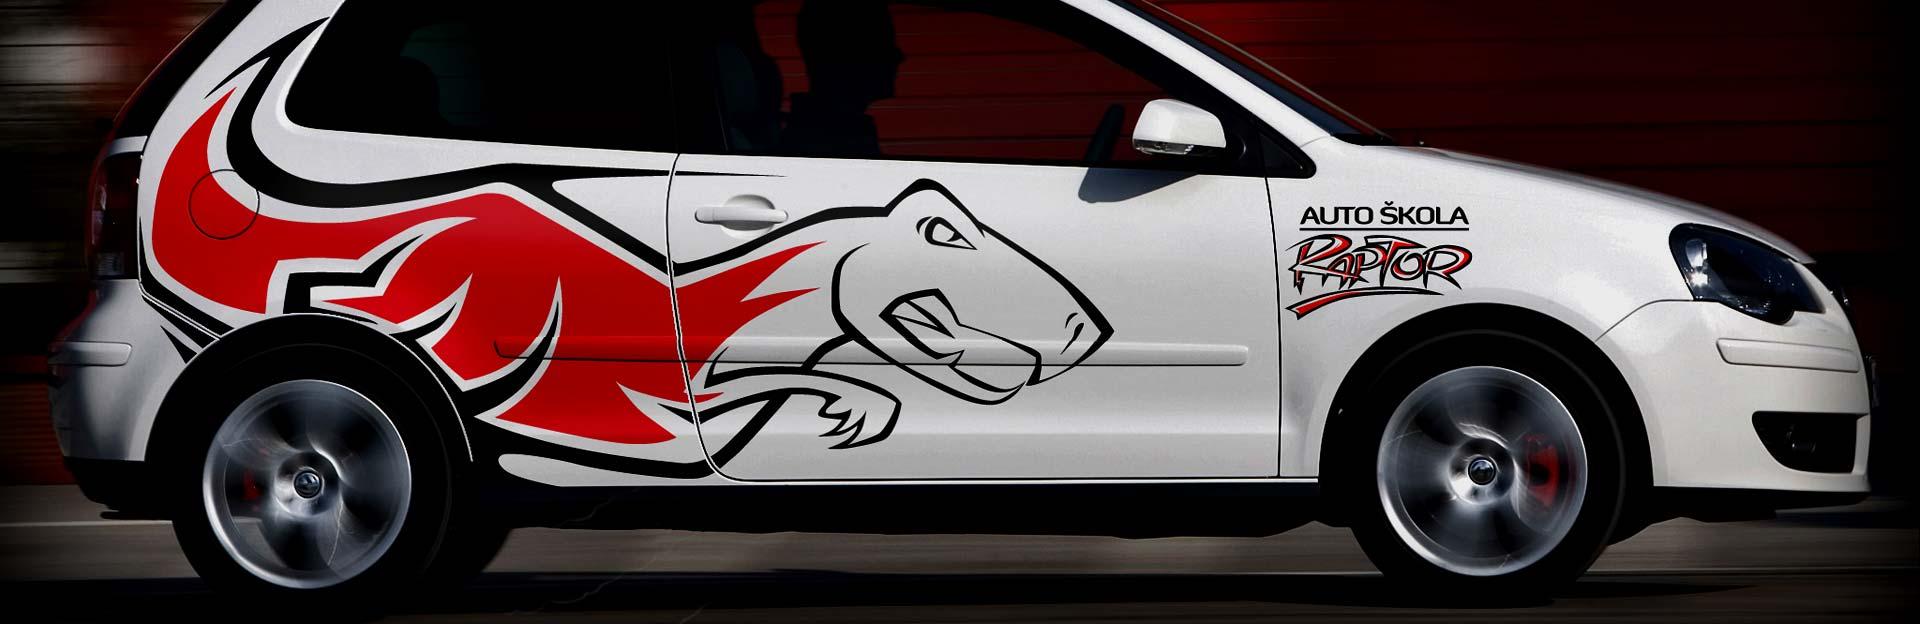 vozni park auto skole raptor